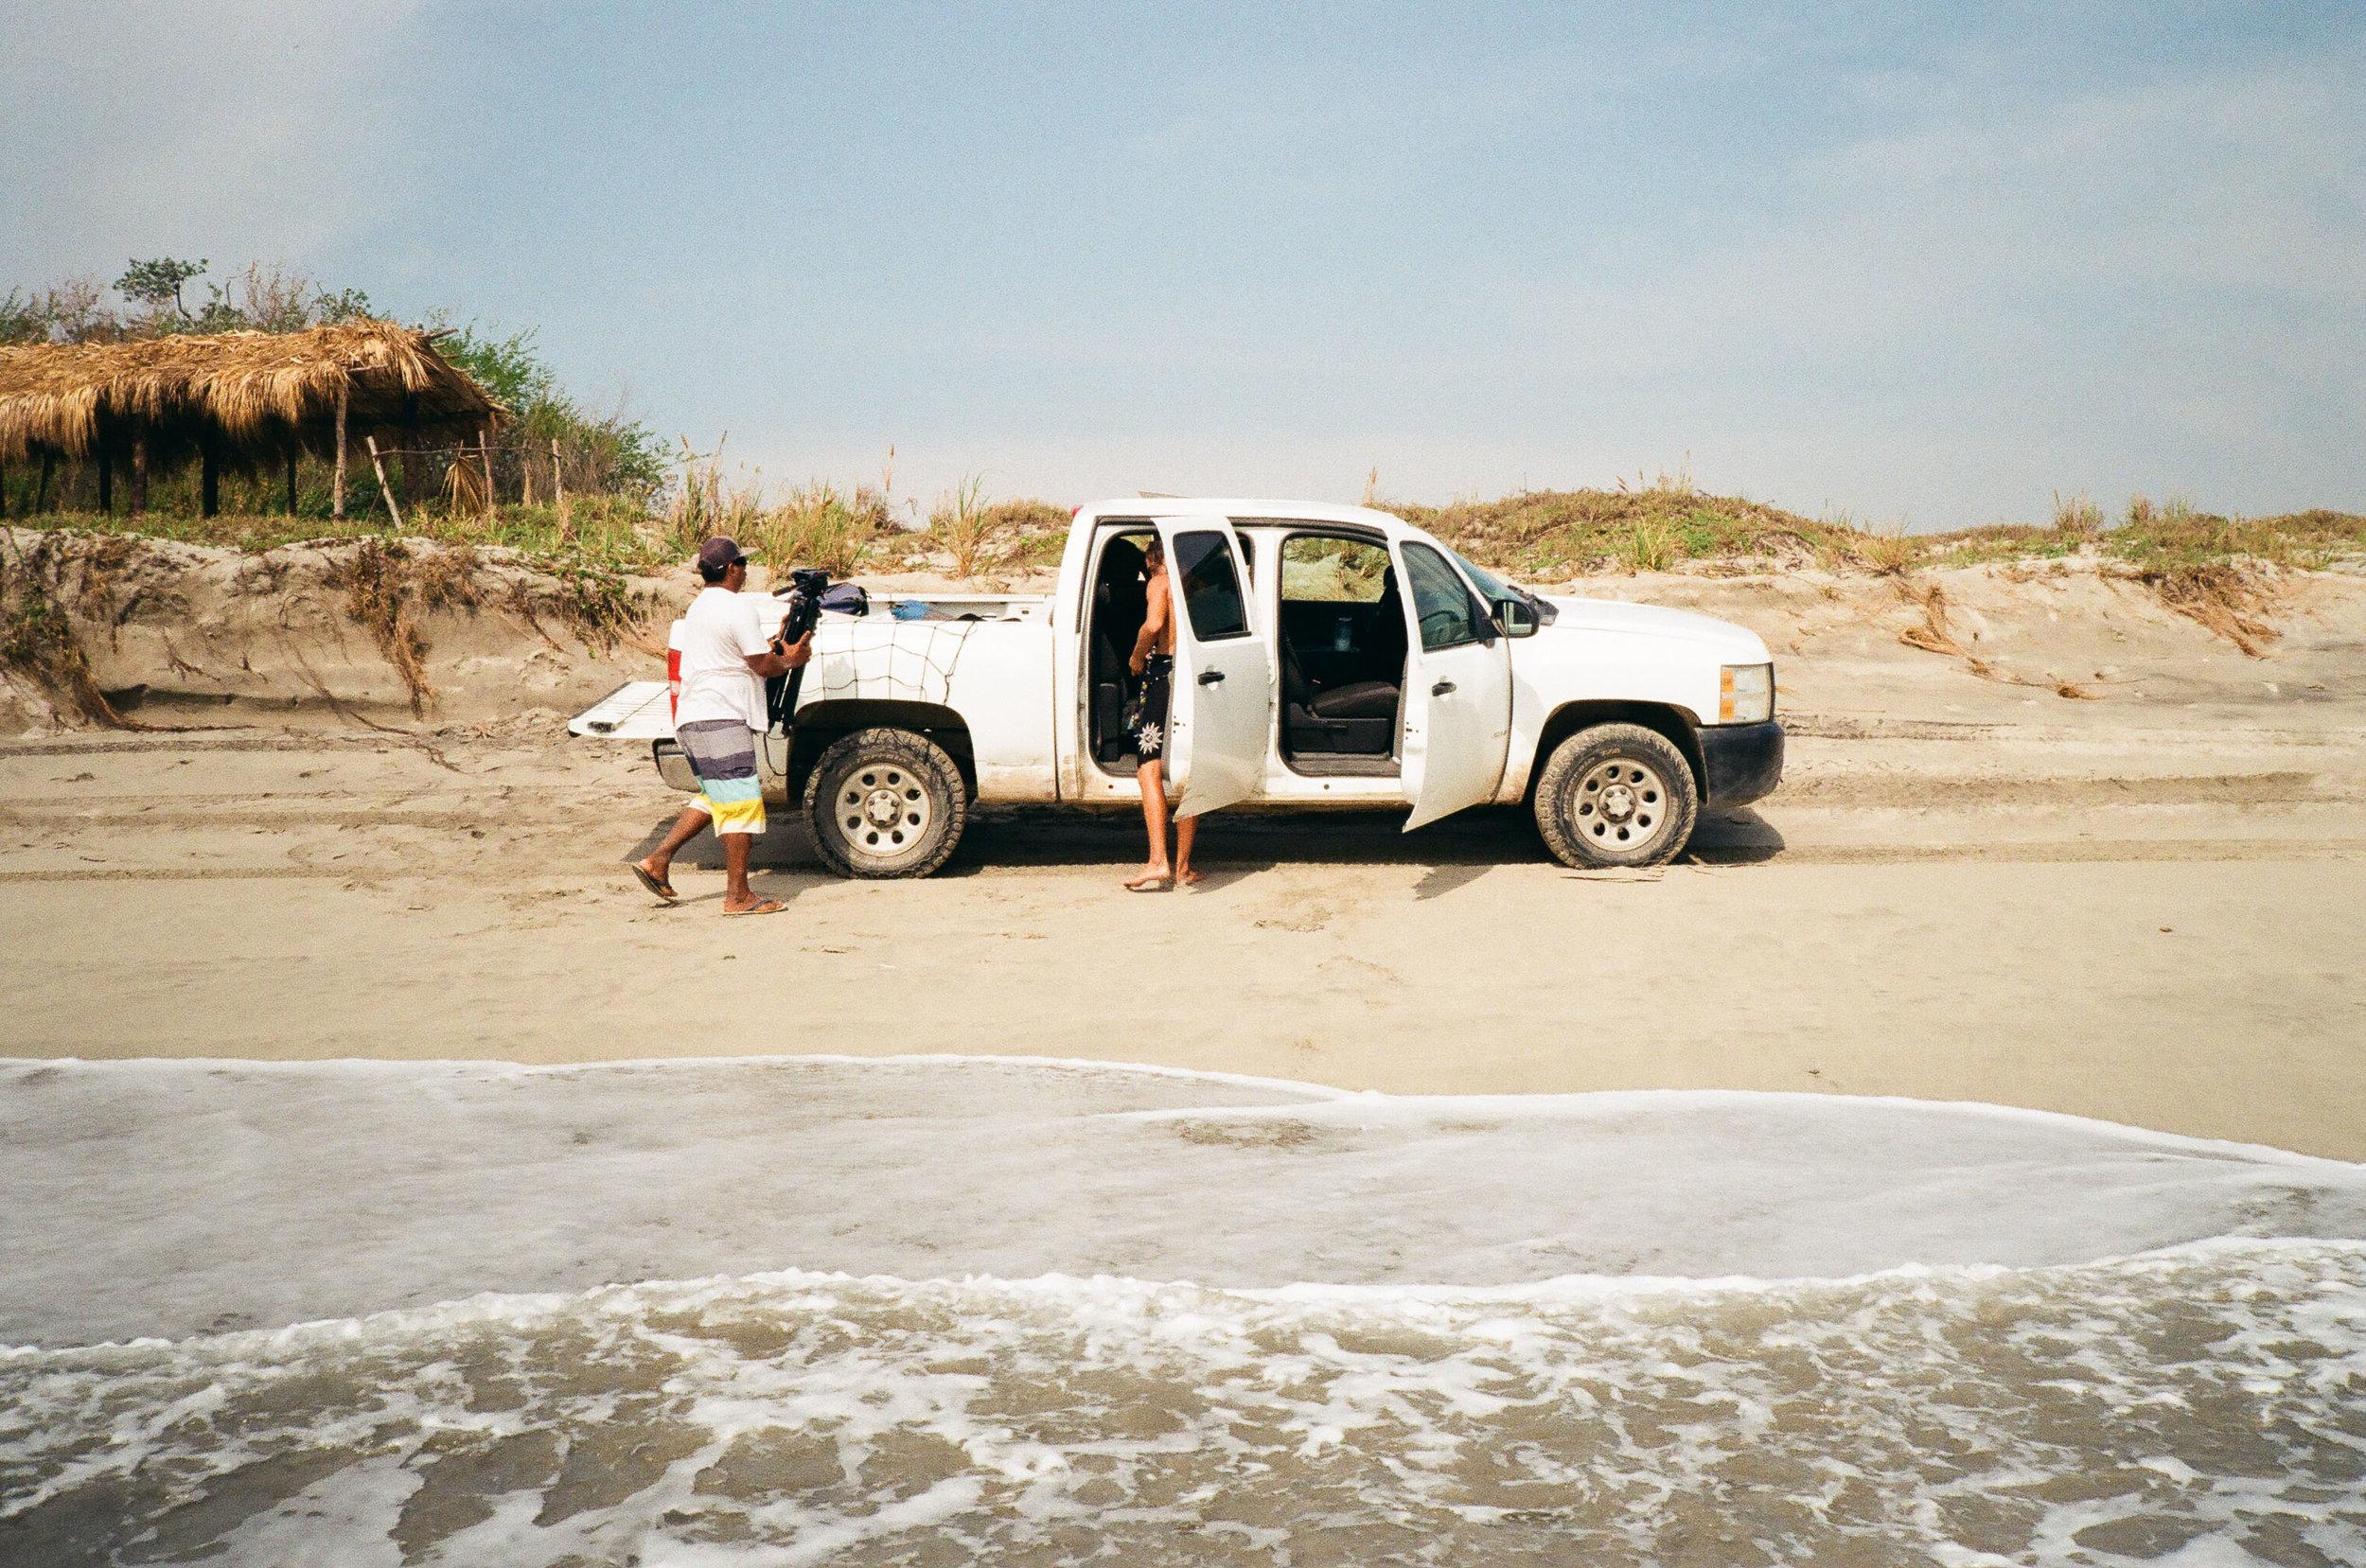 captainbarto-blog-adambartoshesky-model-nautica-client-mexico-surf-trip-mexican-mirage-september-2018-2032.jpg